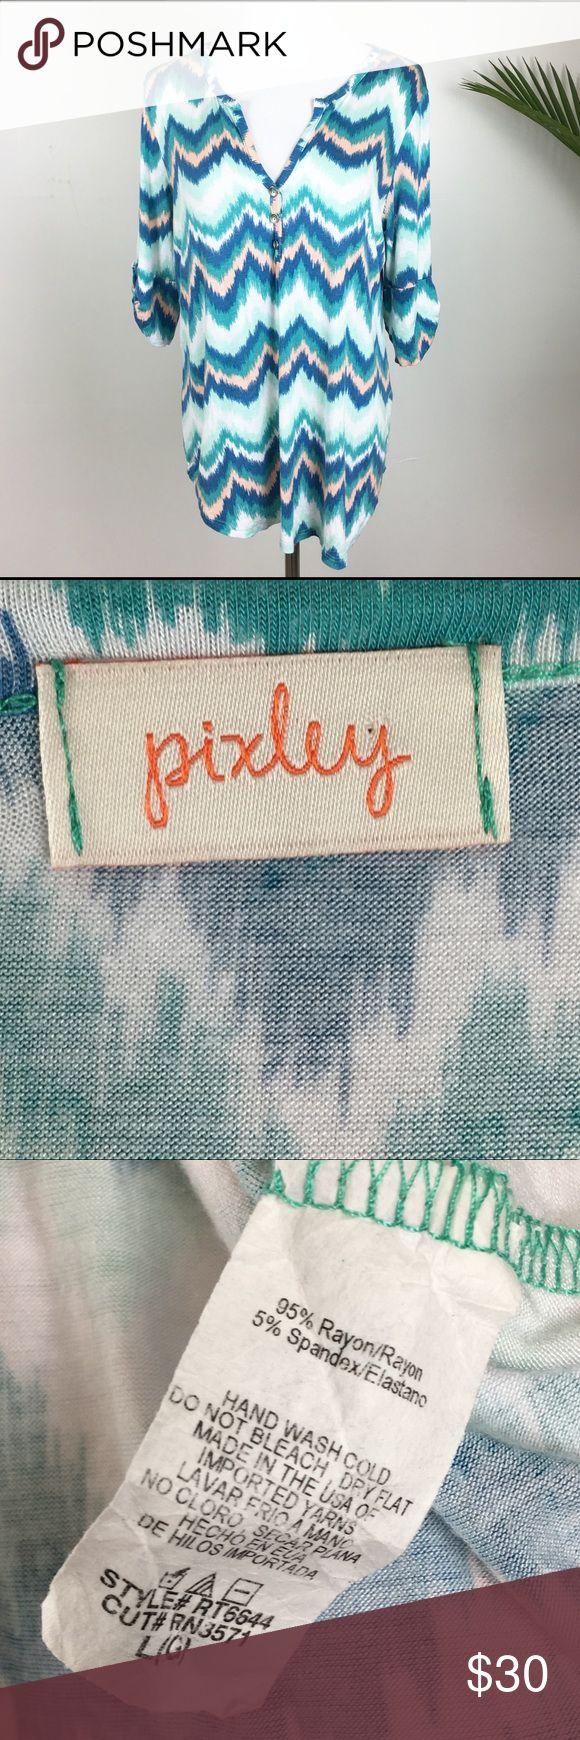 Pixley Large Woman's 3/4 Chevron Top . Pixley Tops Blouses